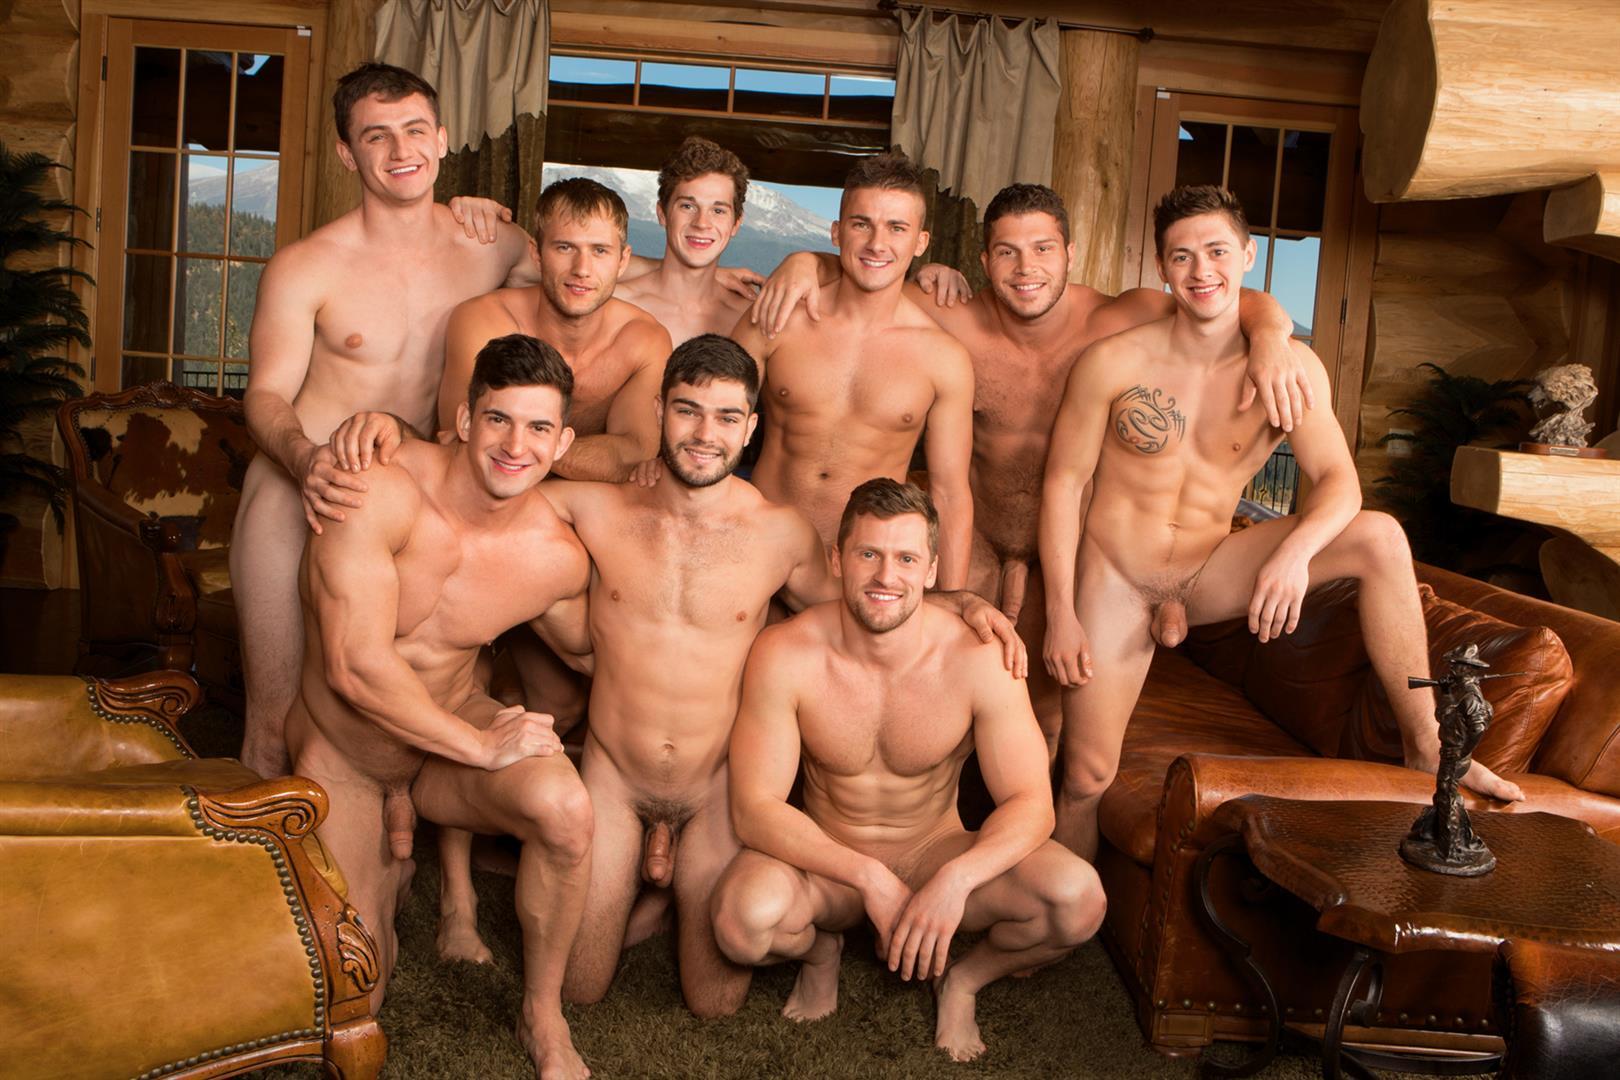 Sean-Cody-Winter-Getaway-Day-5-Big-Dick-Hunks-Fucking-Bareback-Amateur-Gay-Porn-16 Sean Cody Takes The Boys On A 8-Day Bareback Winter Getaway